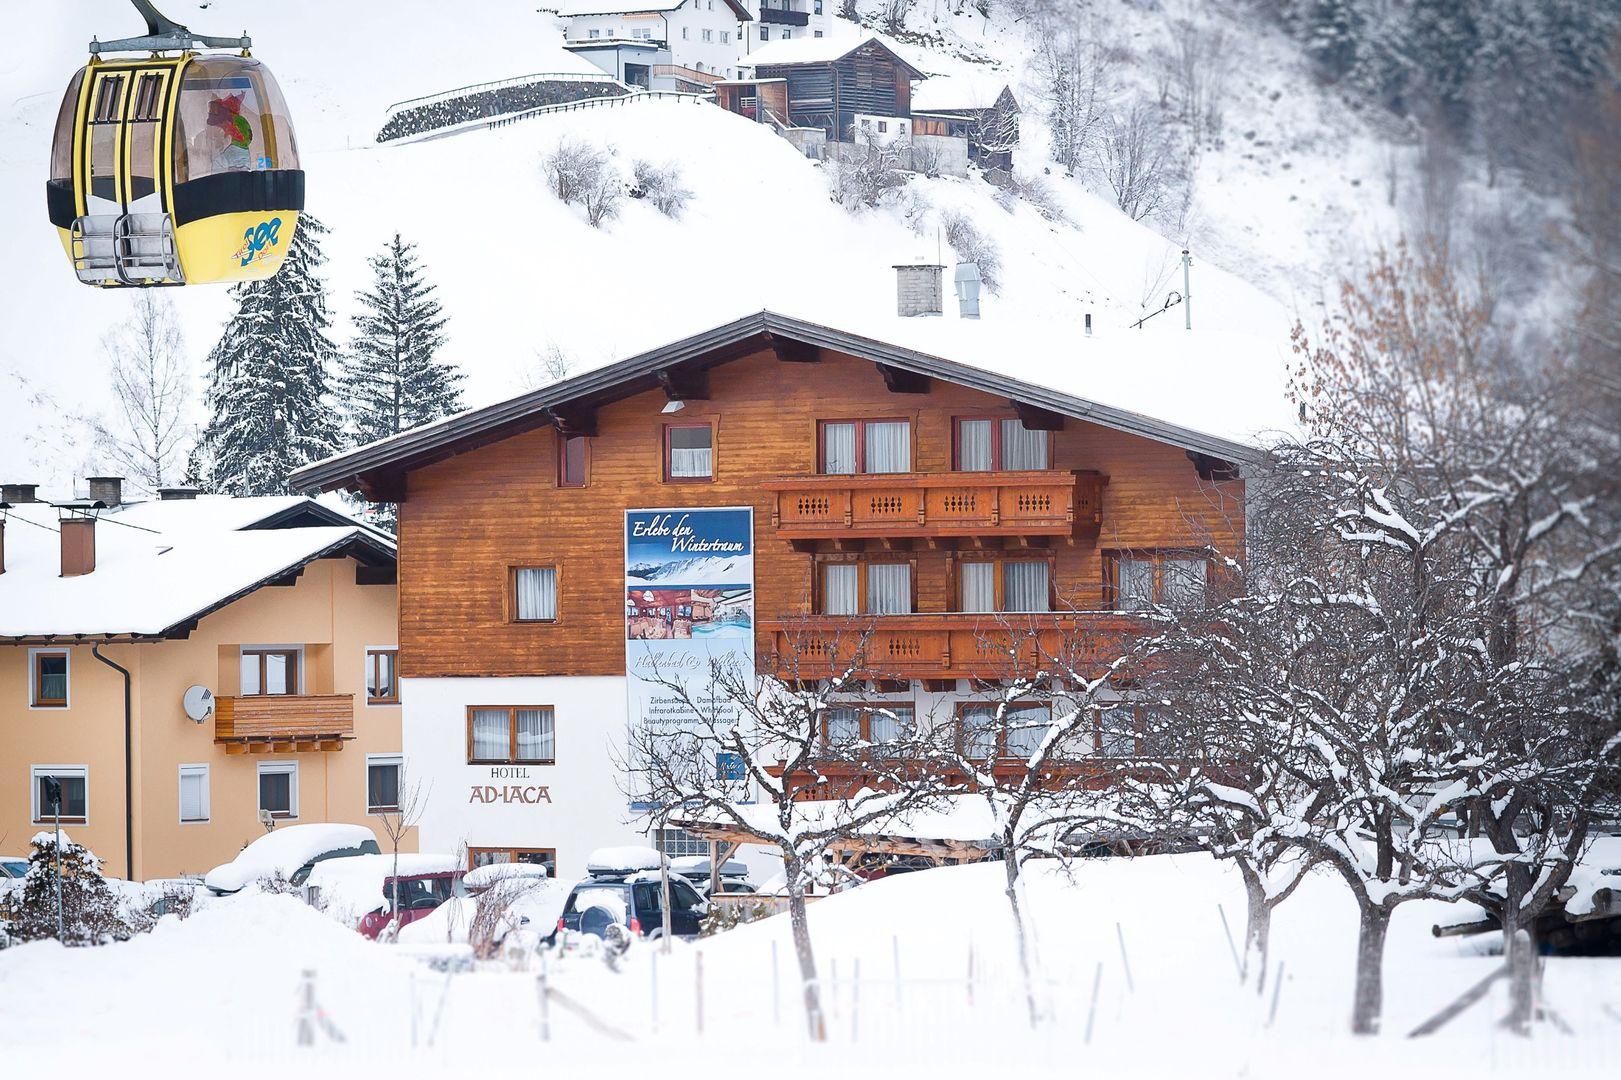 Slide1 - Natur.Hotels.See Hotel Ad Laca